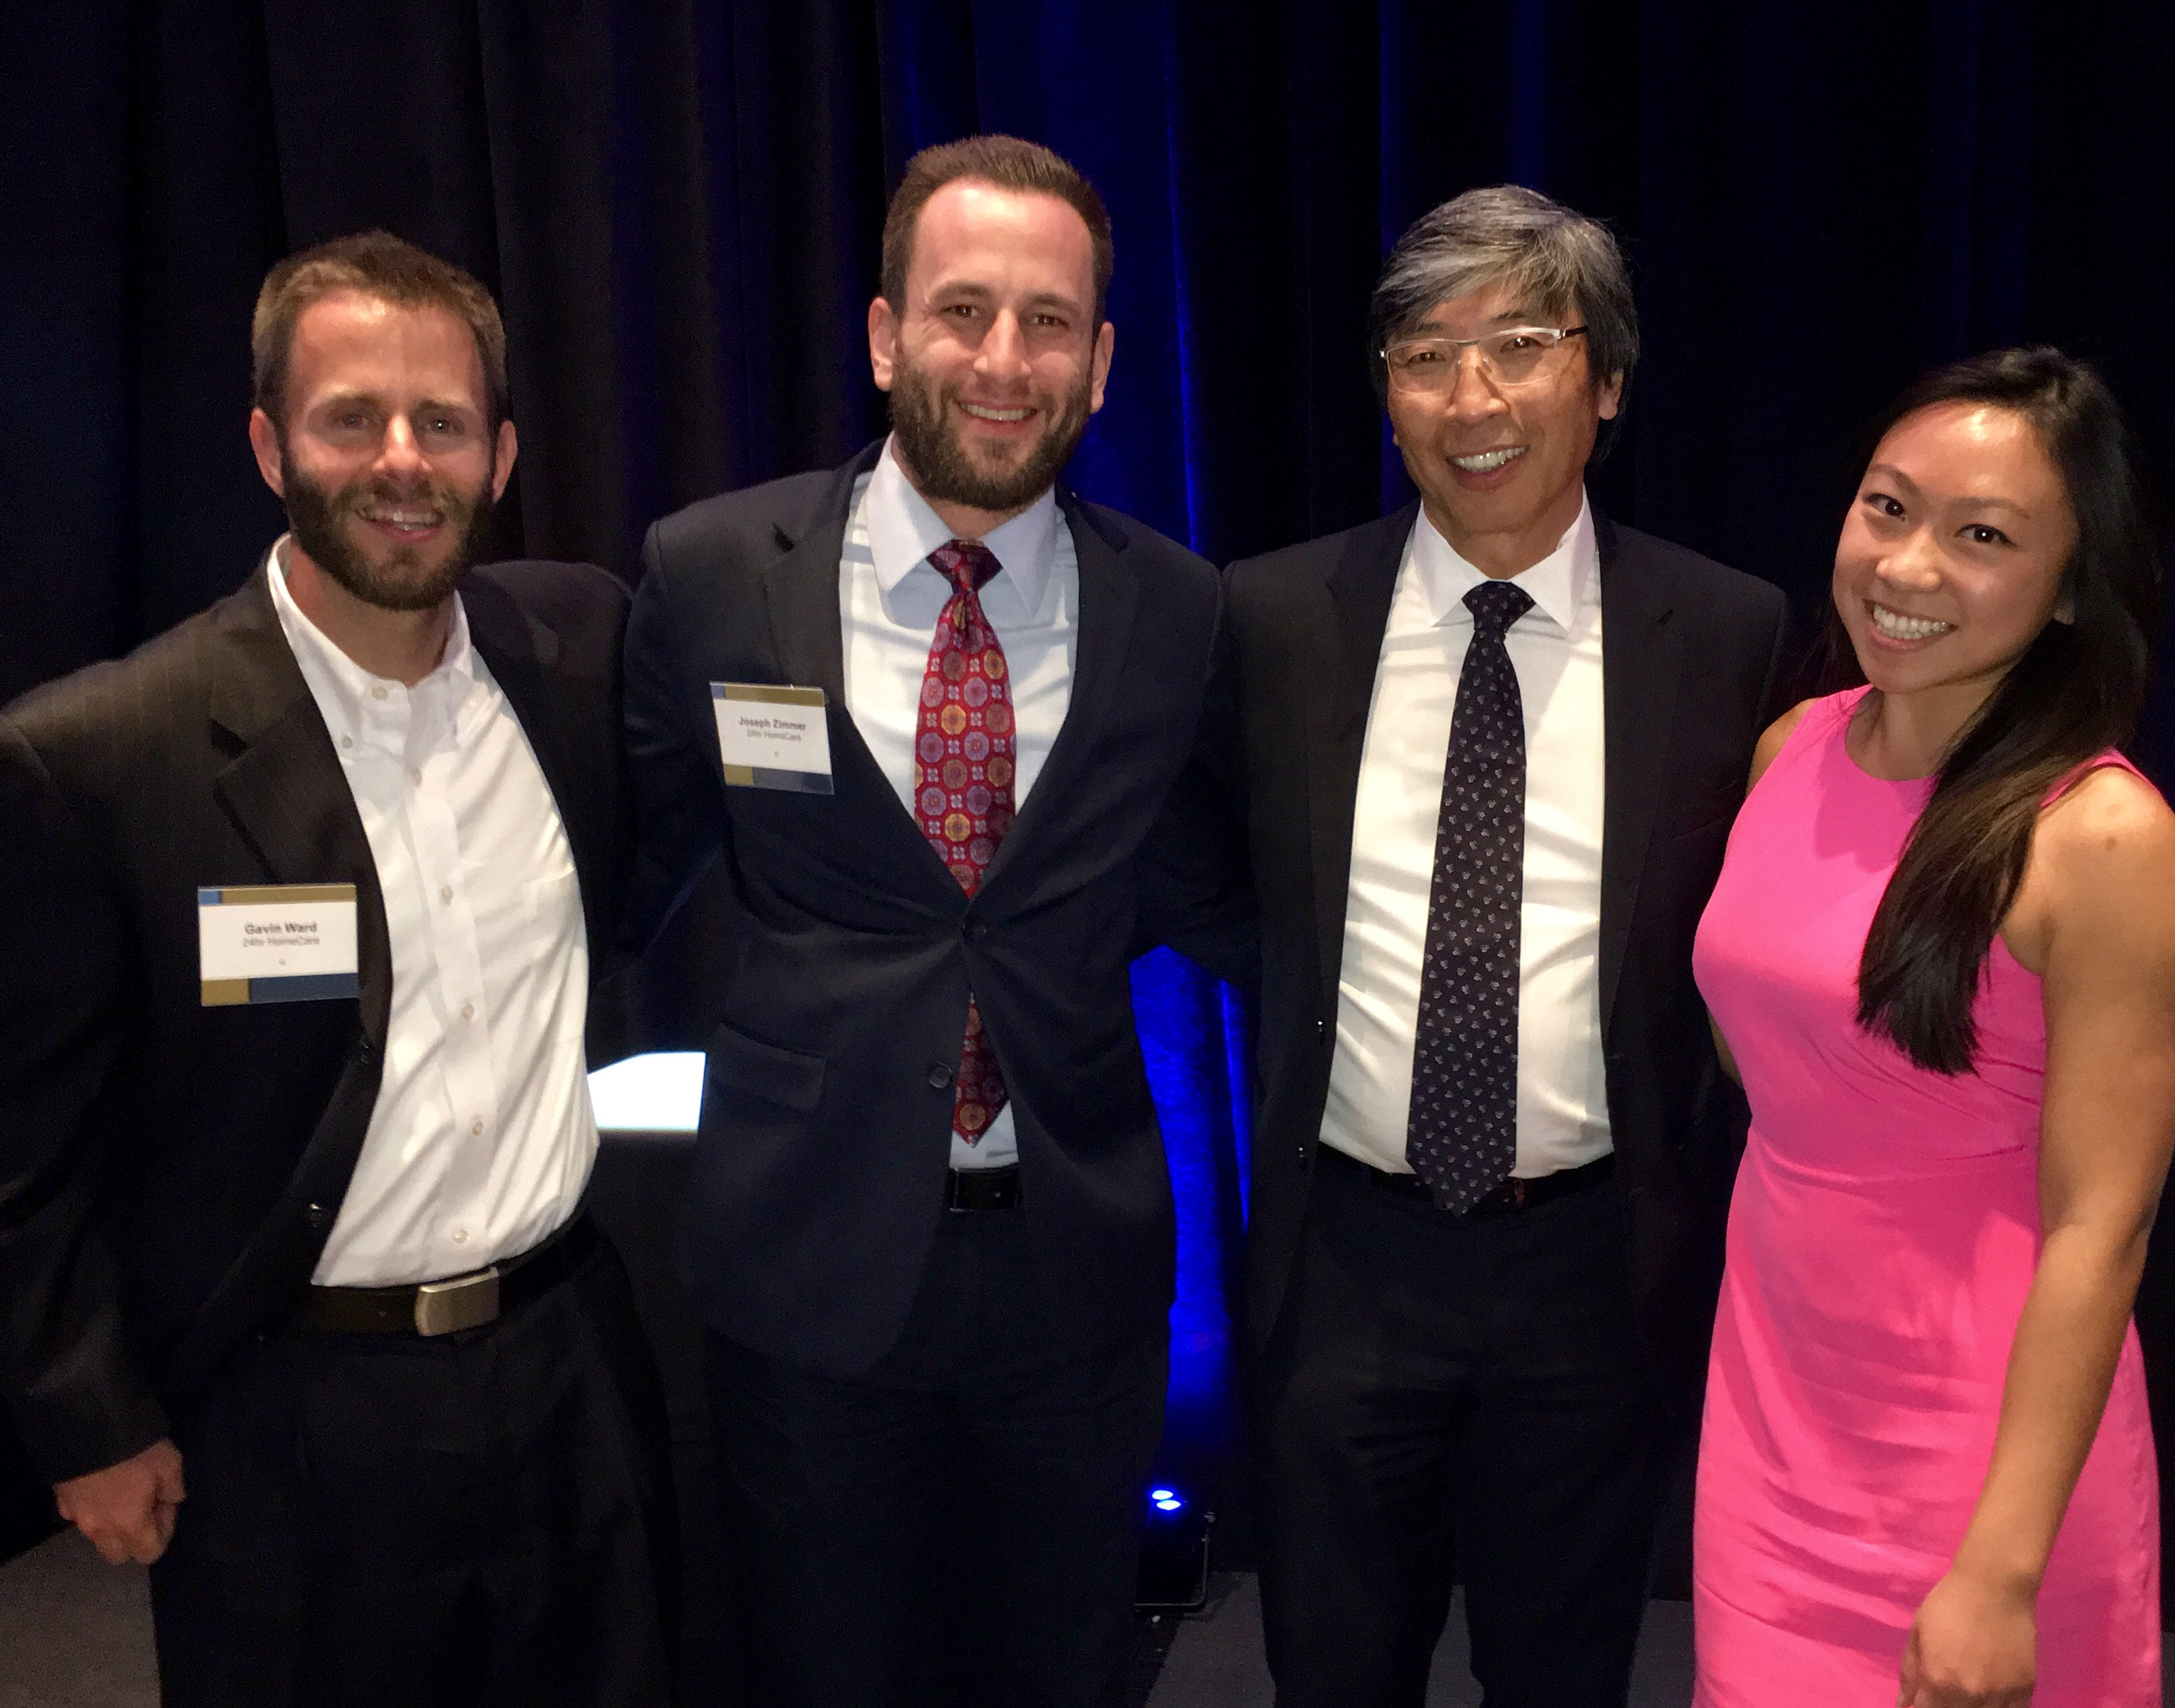 2015 Patrick Soon-Shiong Innovation Awards